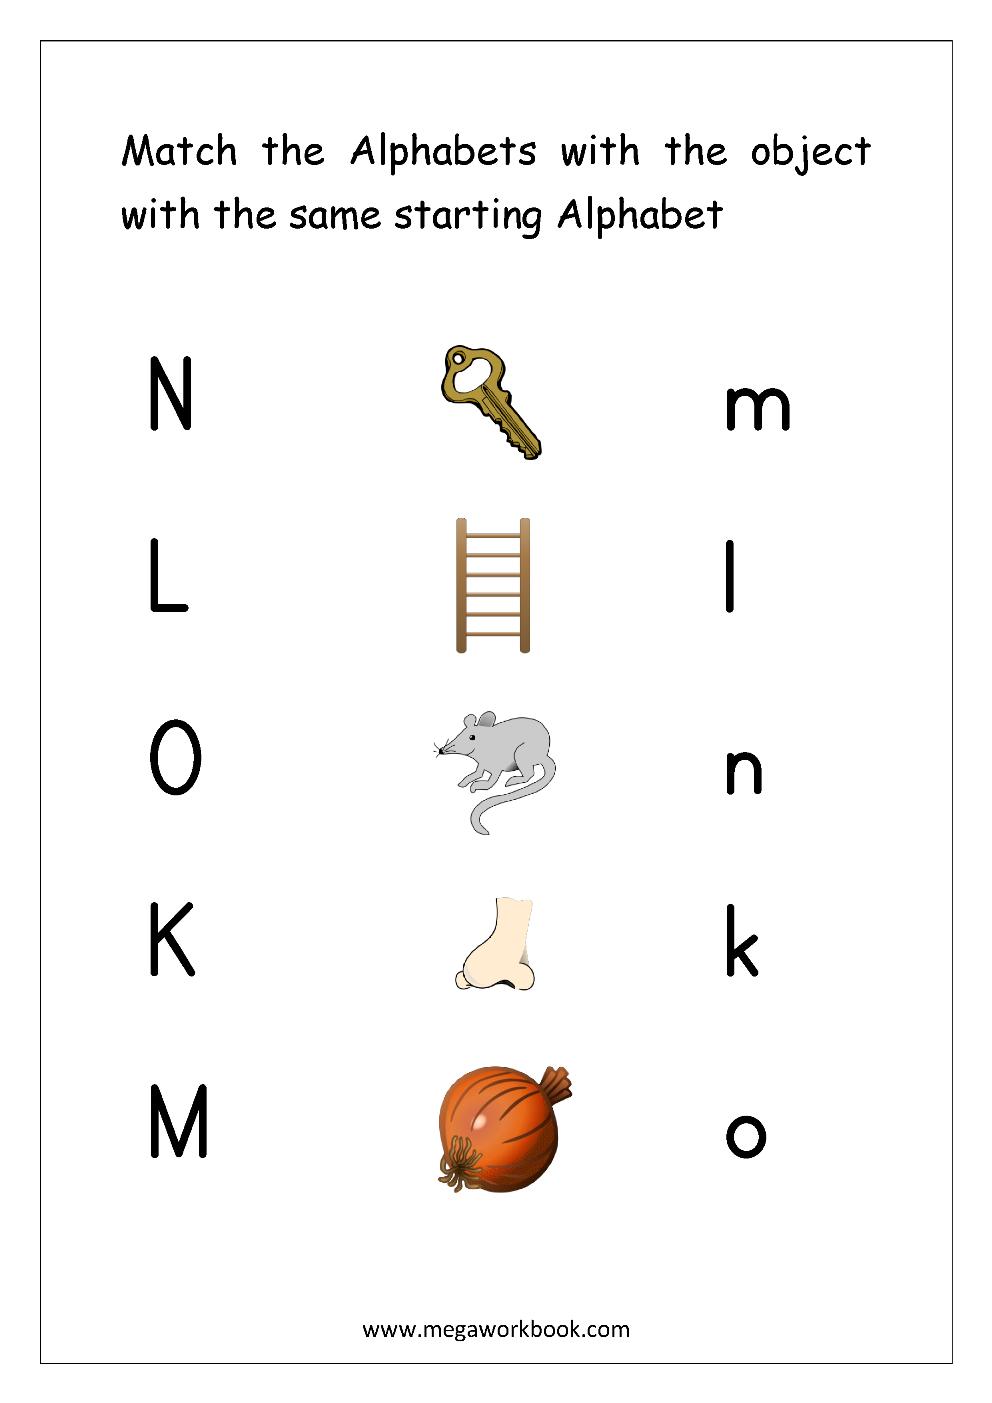 Free English Worksheets - Alphabet Matching - Megaworkbook inside Alphabet Matching Worksheets For Pre-K